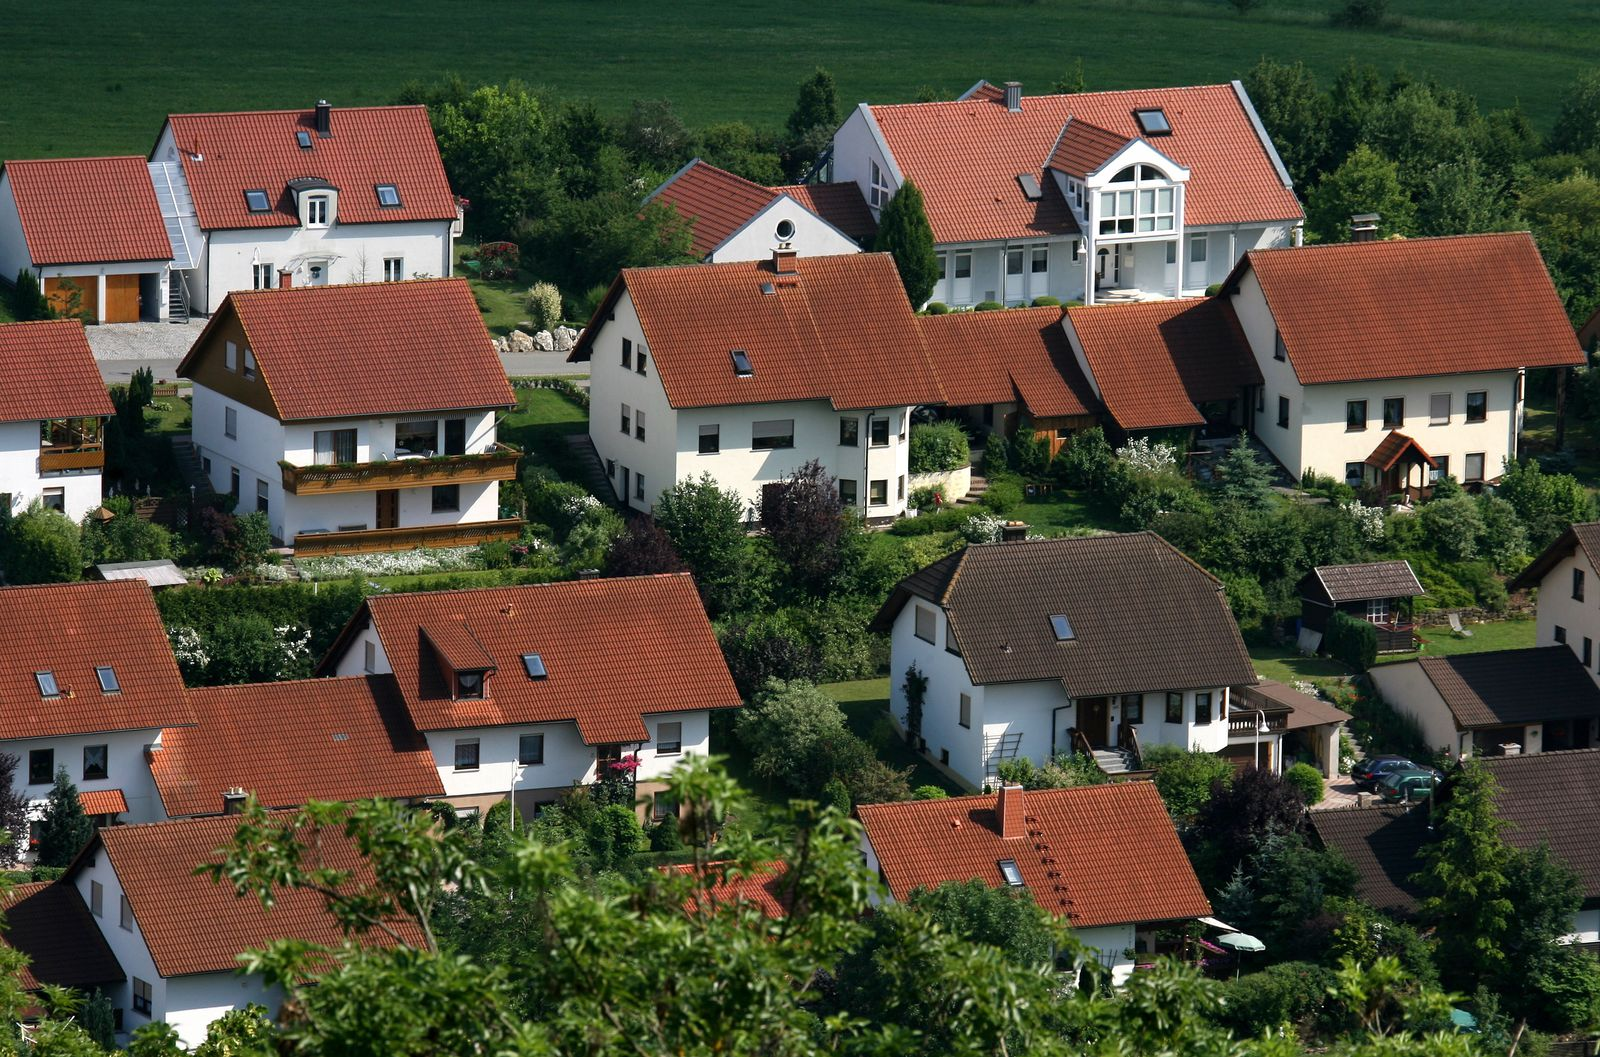 Thüringer Immobilienmarkt / Immobilien / Neubauten München / Immobilienmarkt